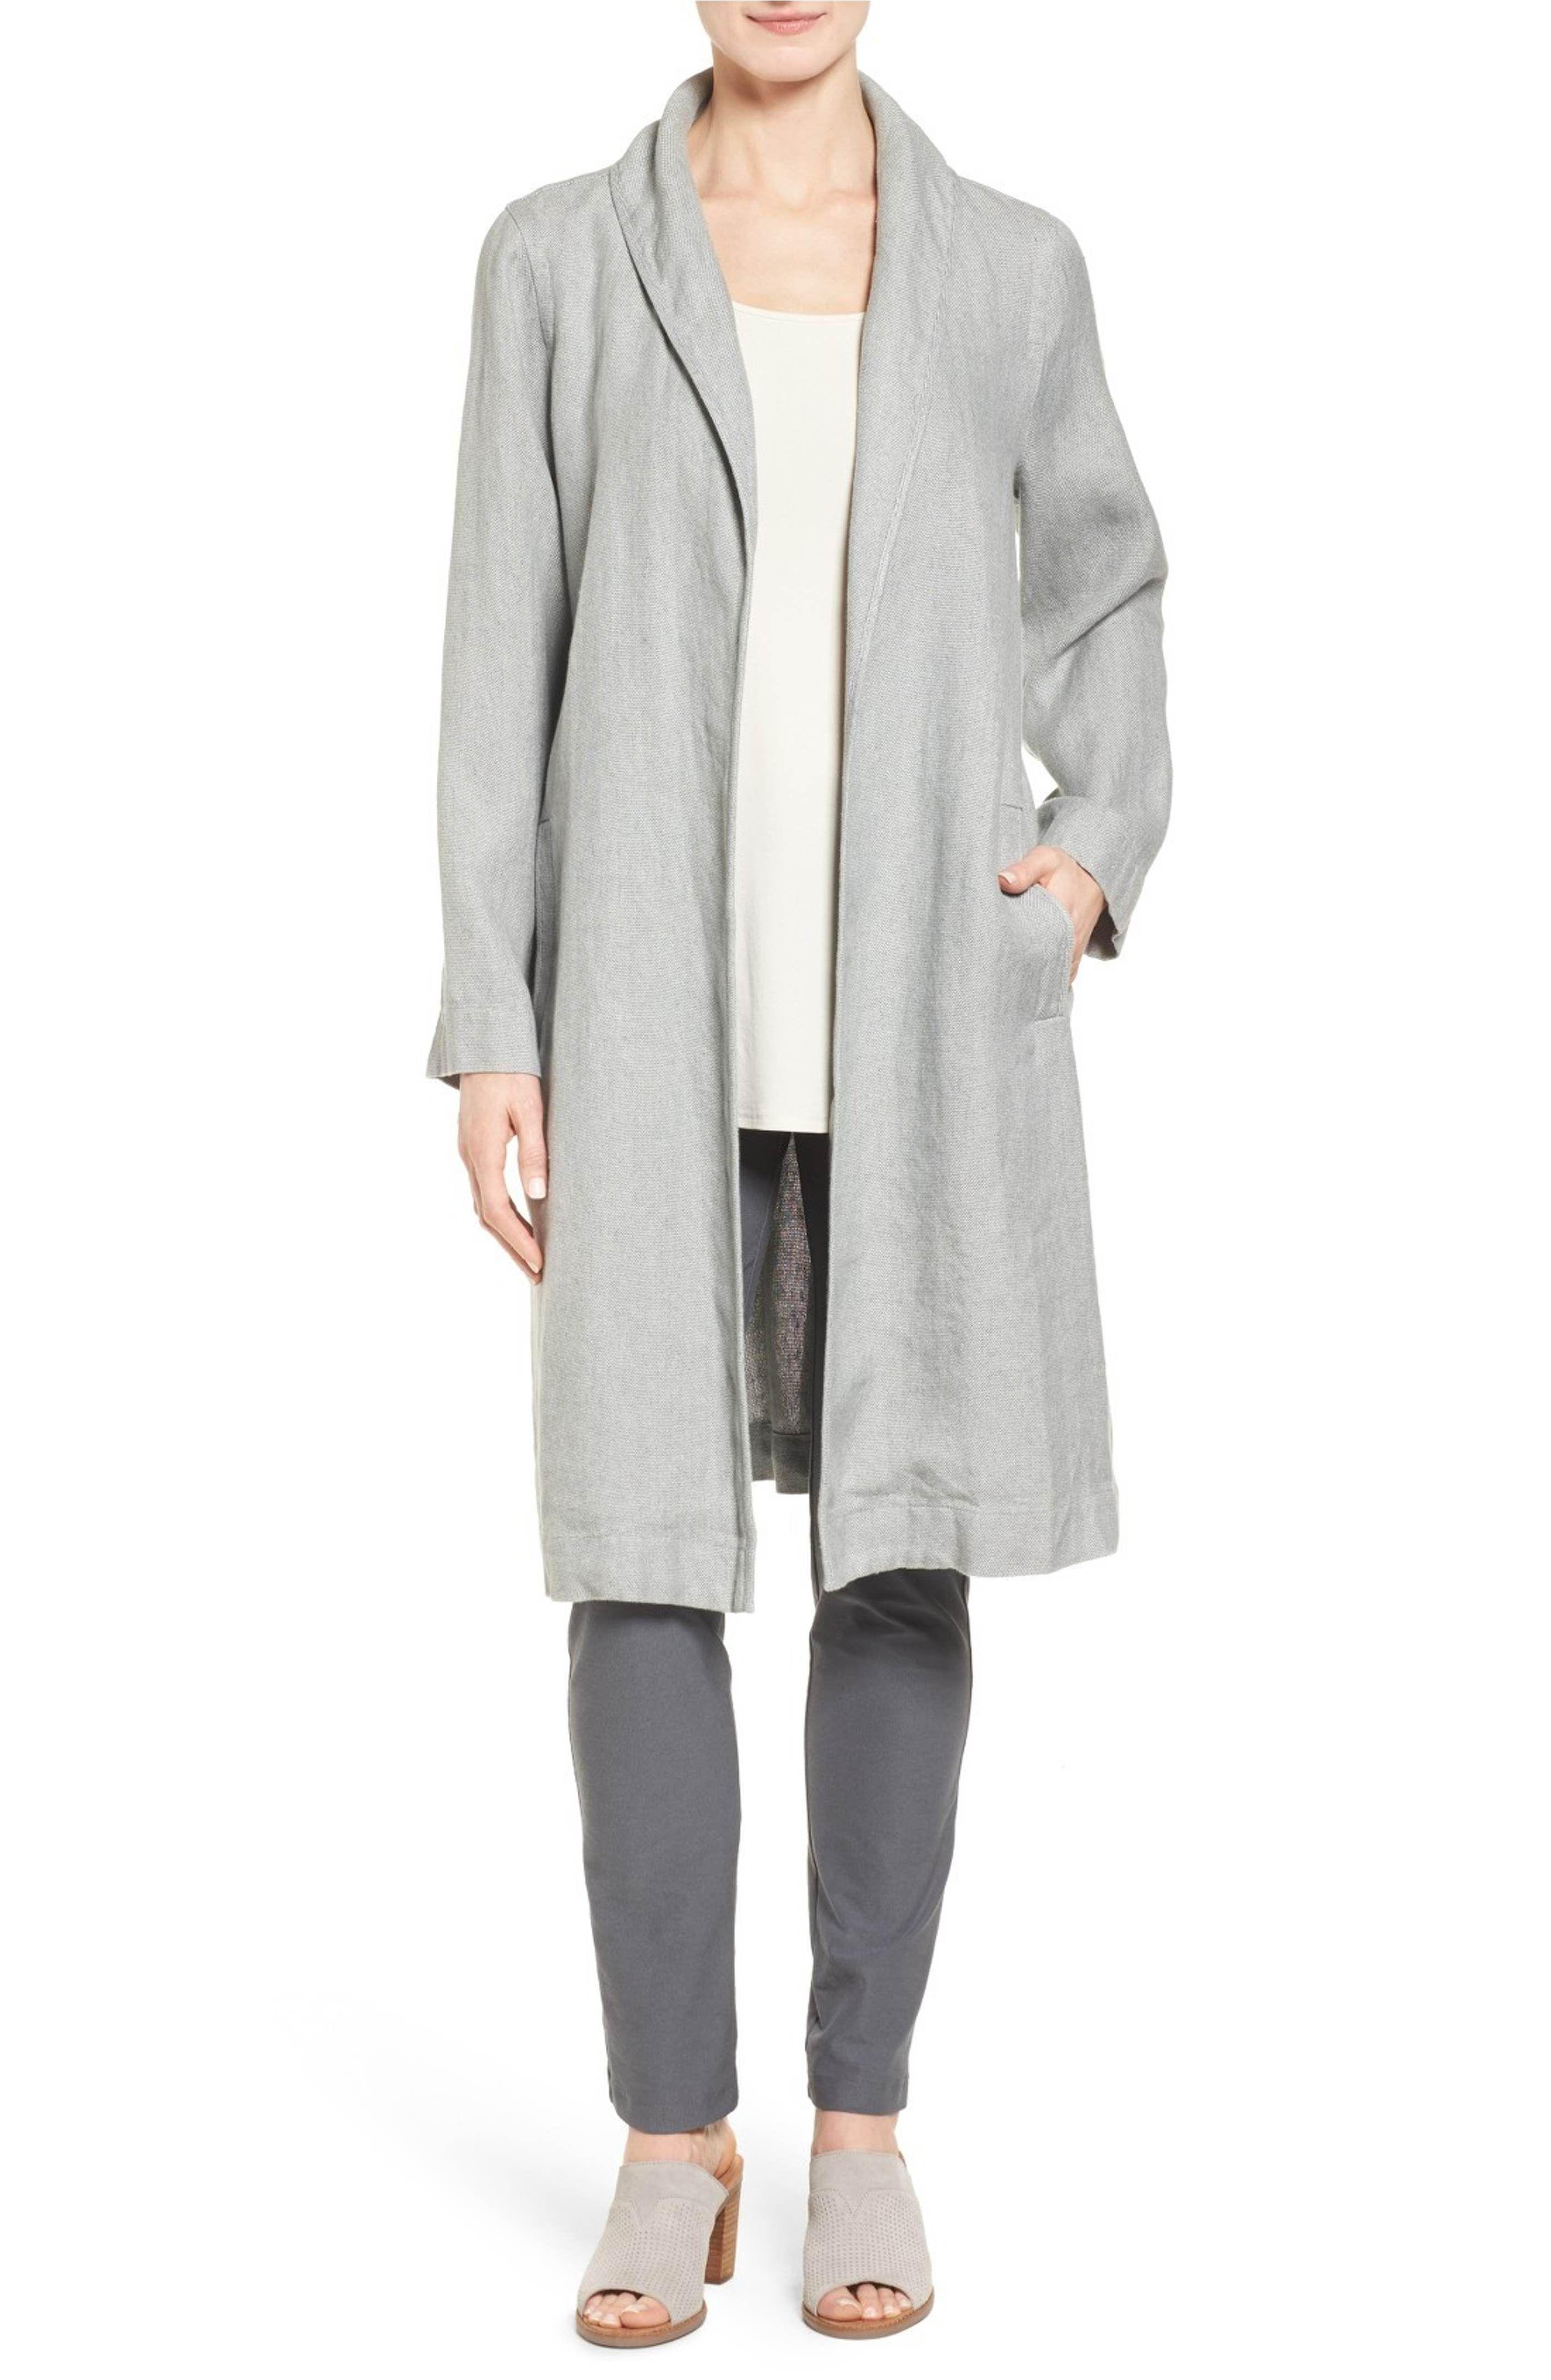 Eileen Fisher Long Organic Linen Jacket Regular Petite Nordstrom Linen Jackets Organic Linens Winter Coats Jackets [ 4320 x 2816 Pixel ]